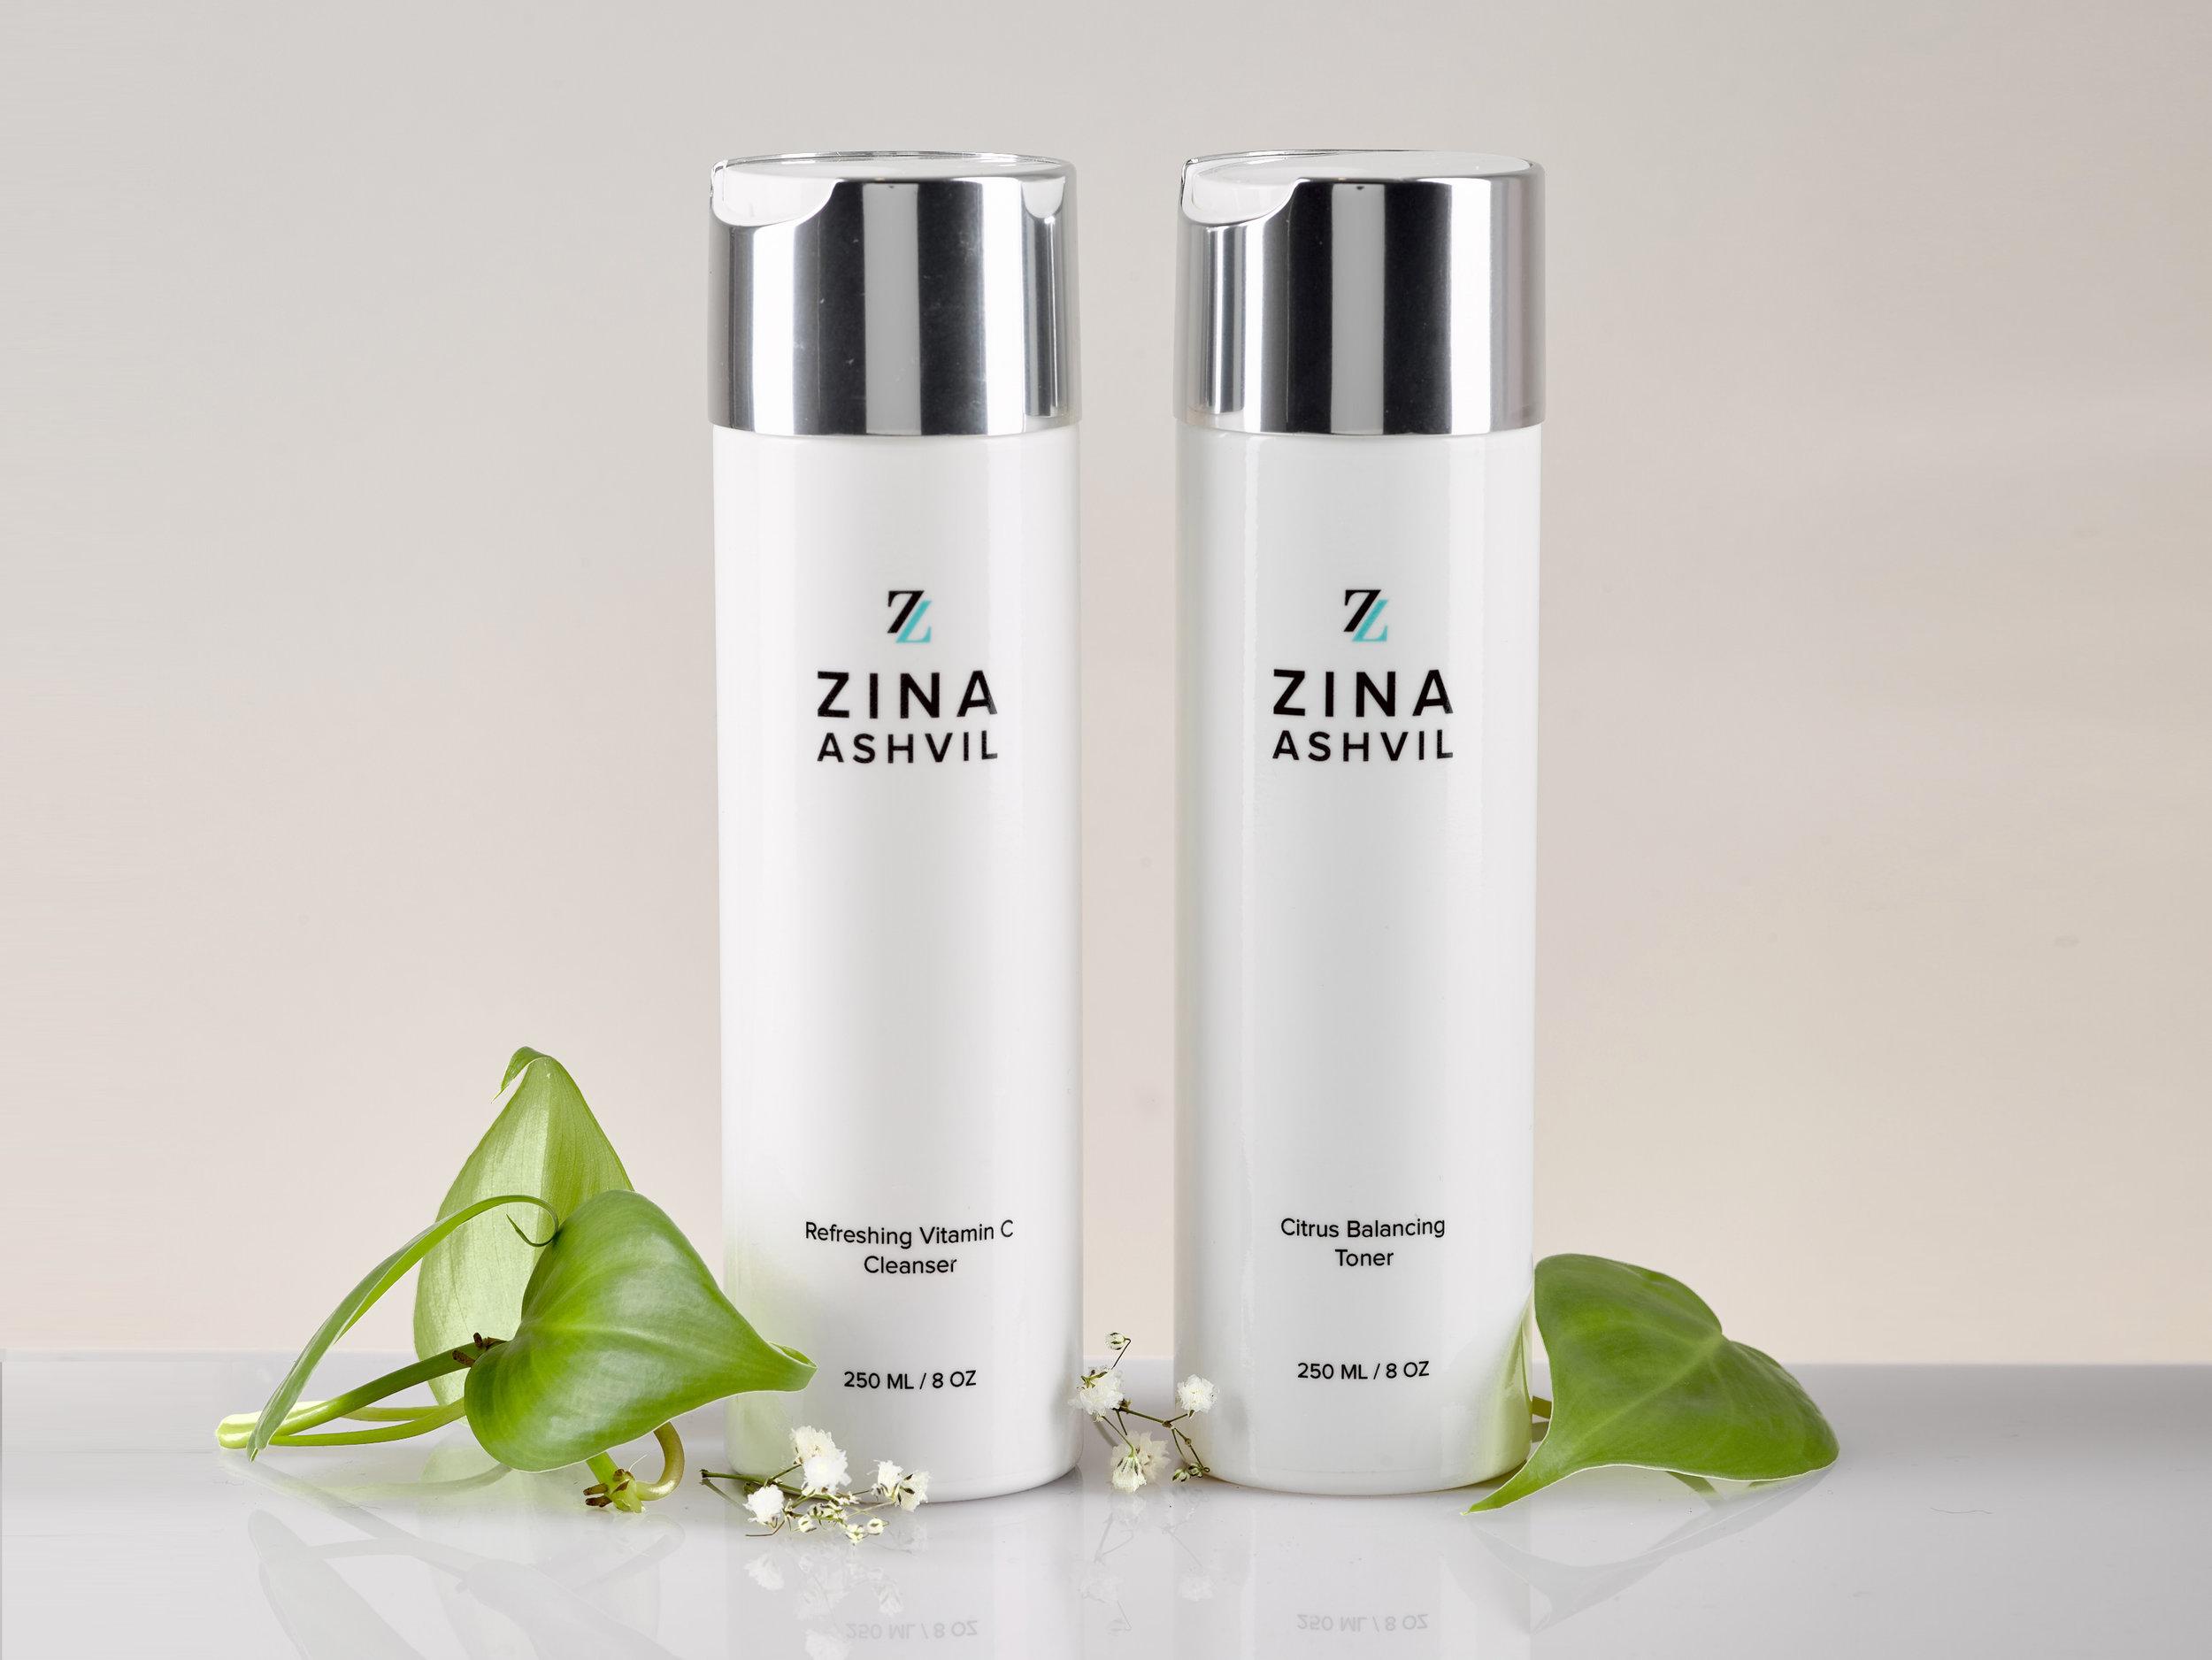 zina ashvil skincare products-cleanser and toner.jpg